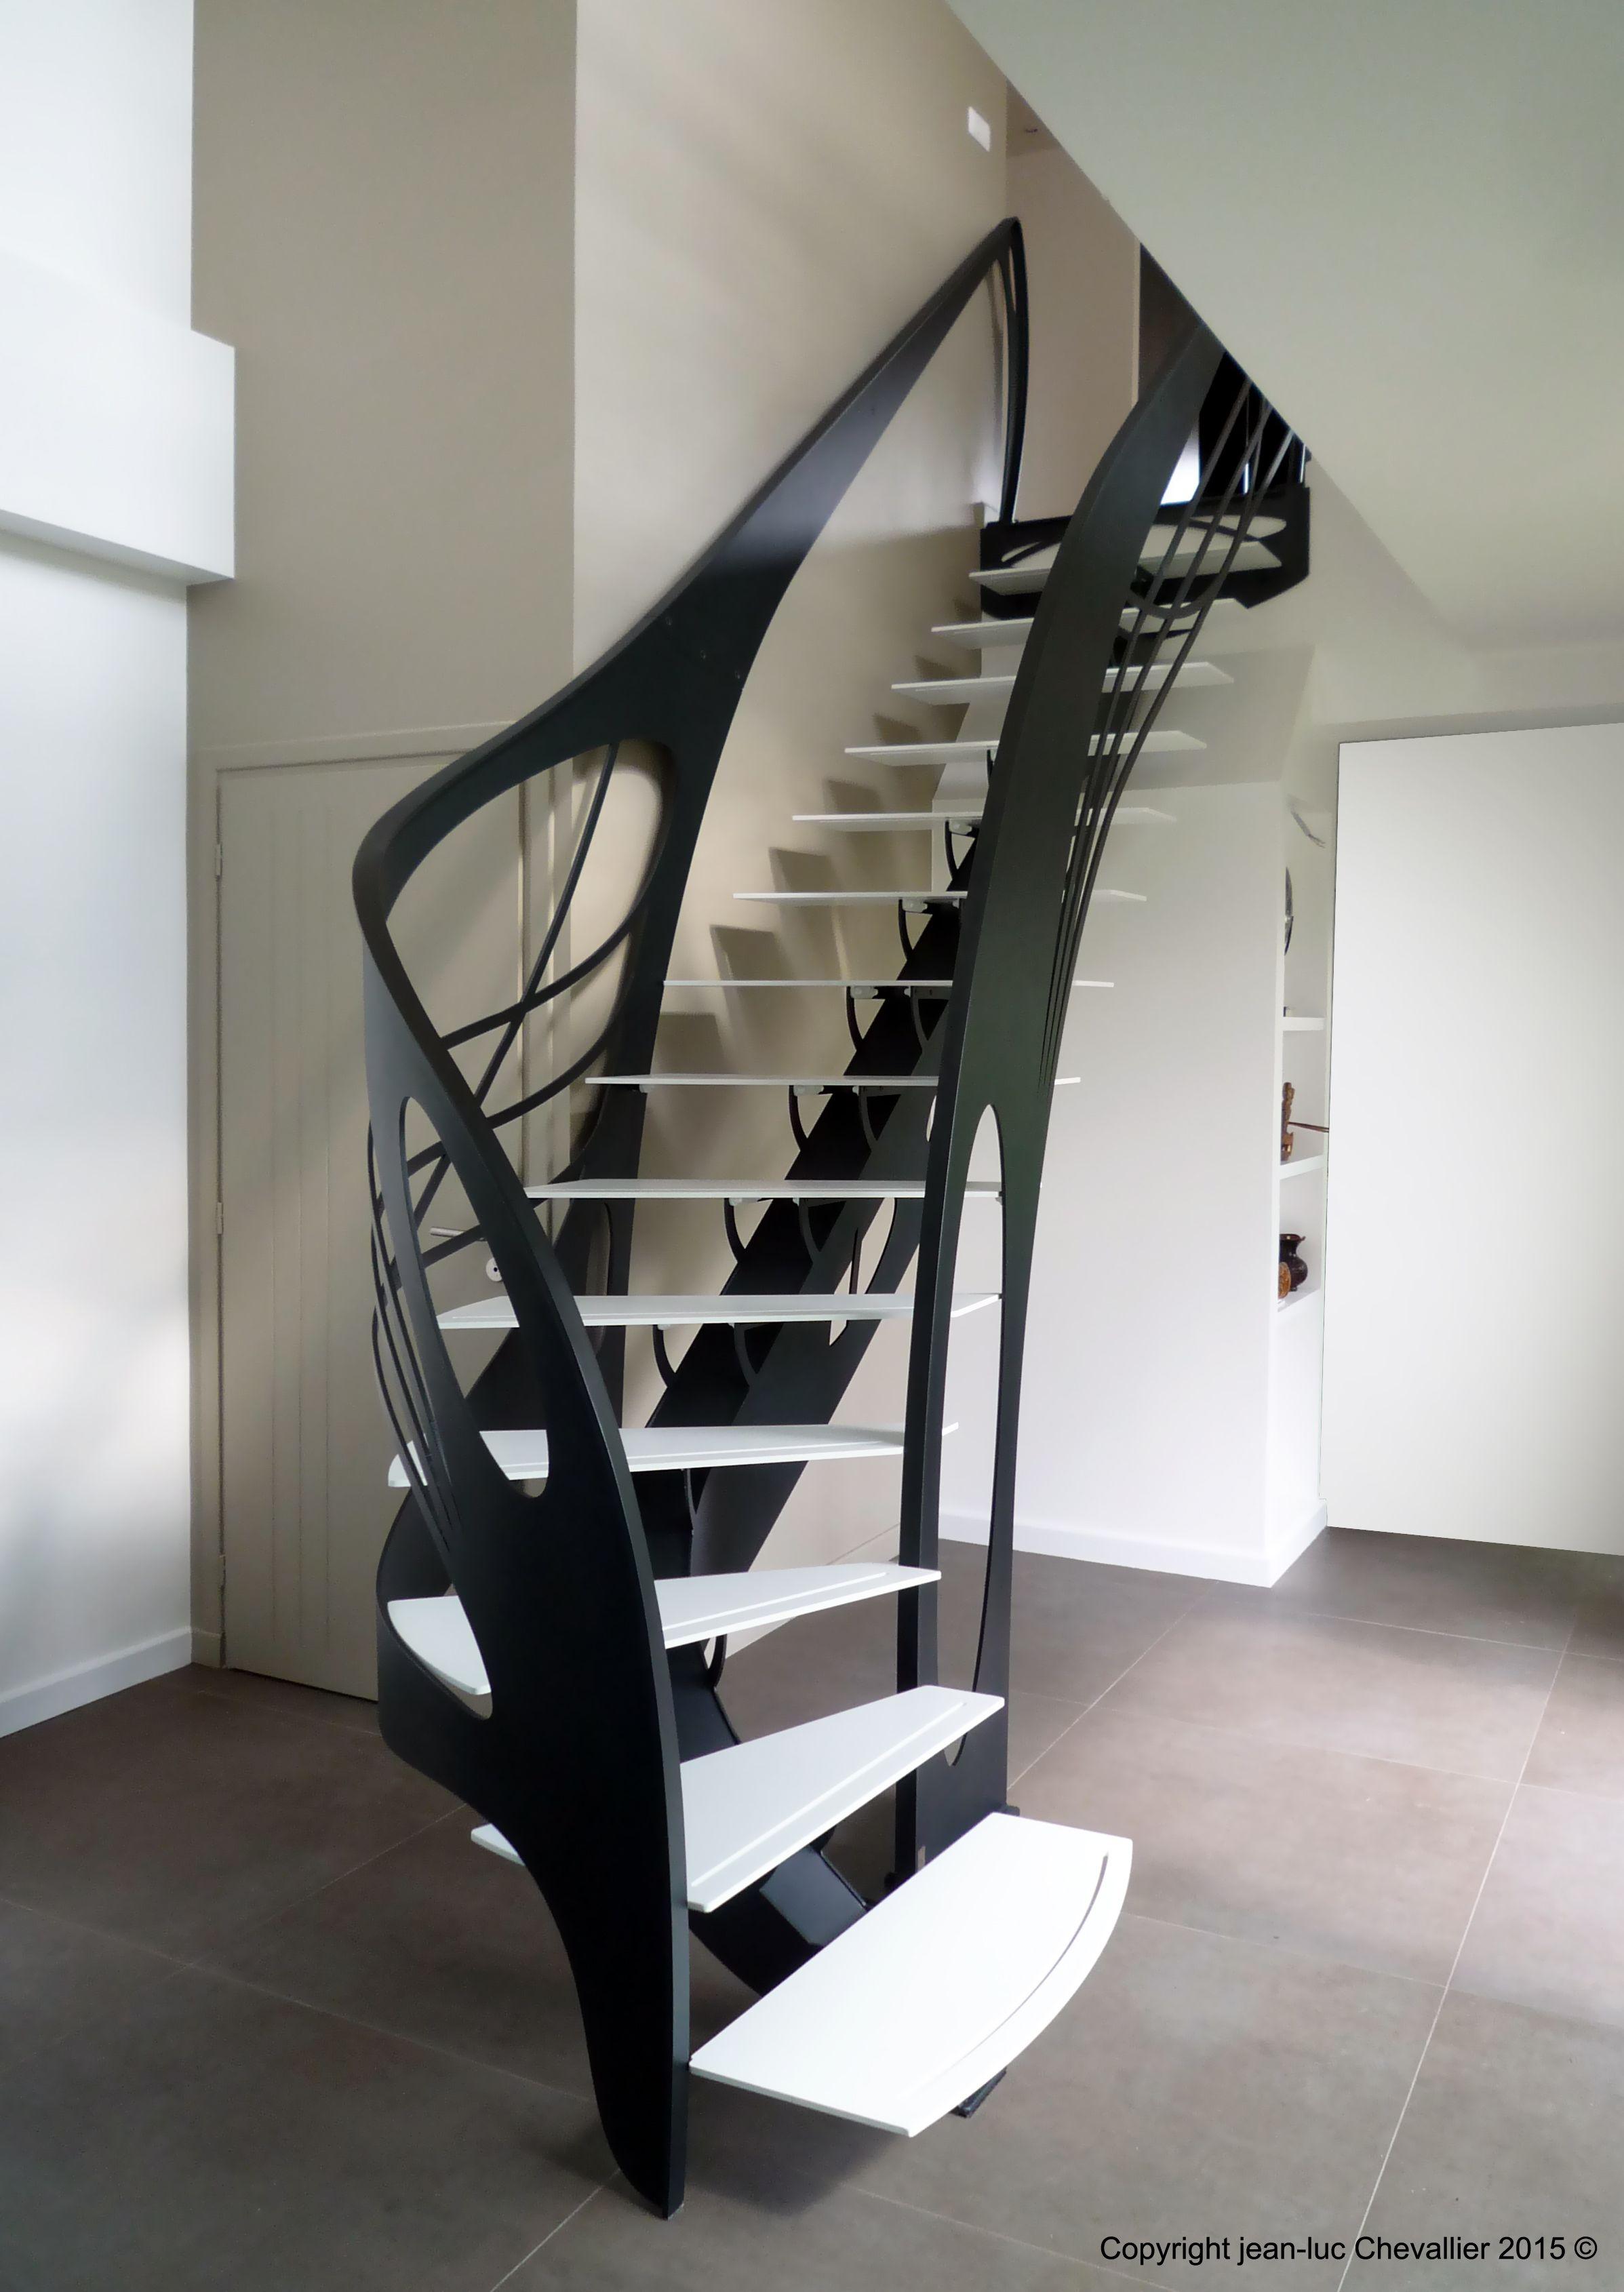 Cr ation d escalier design d billard design art nouveau - Escalier debillarde ...